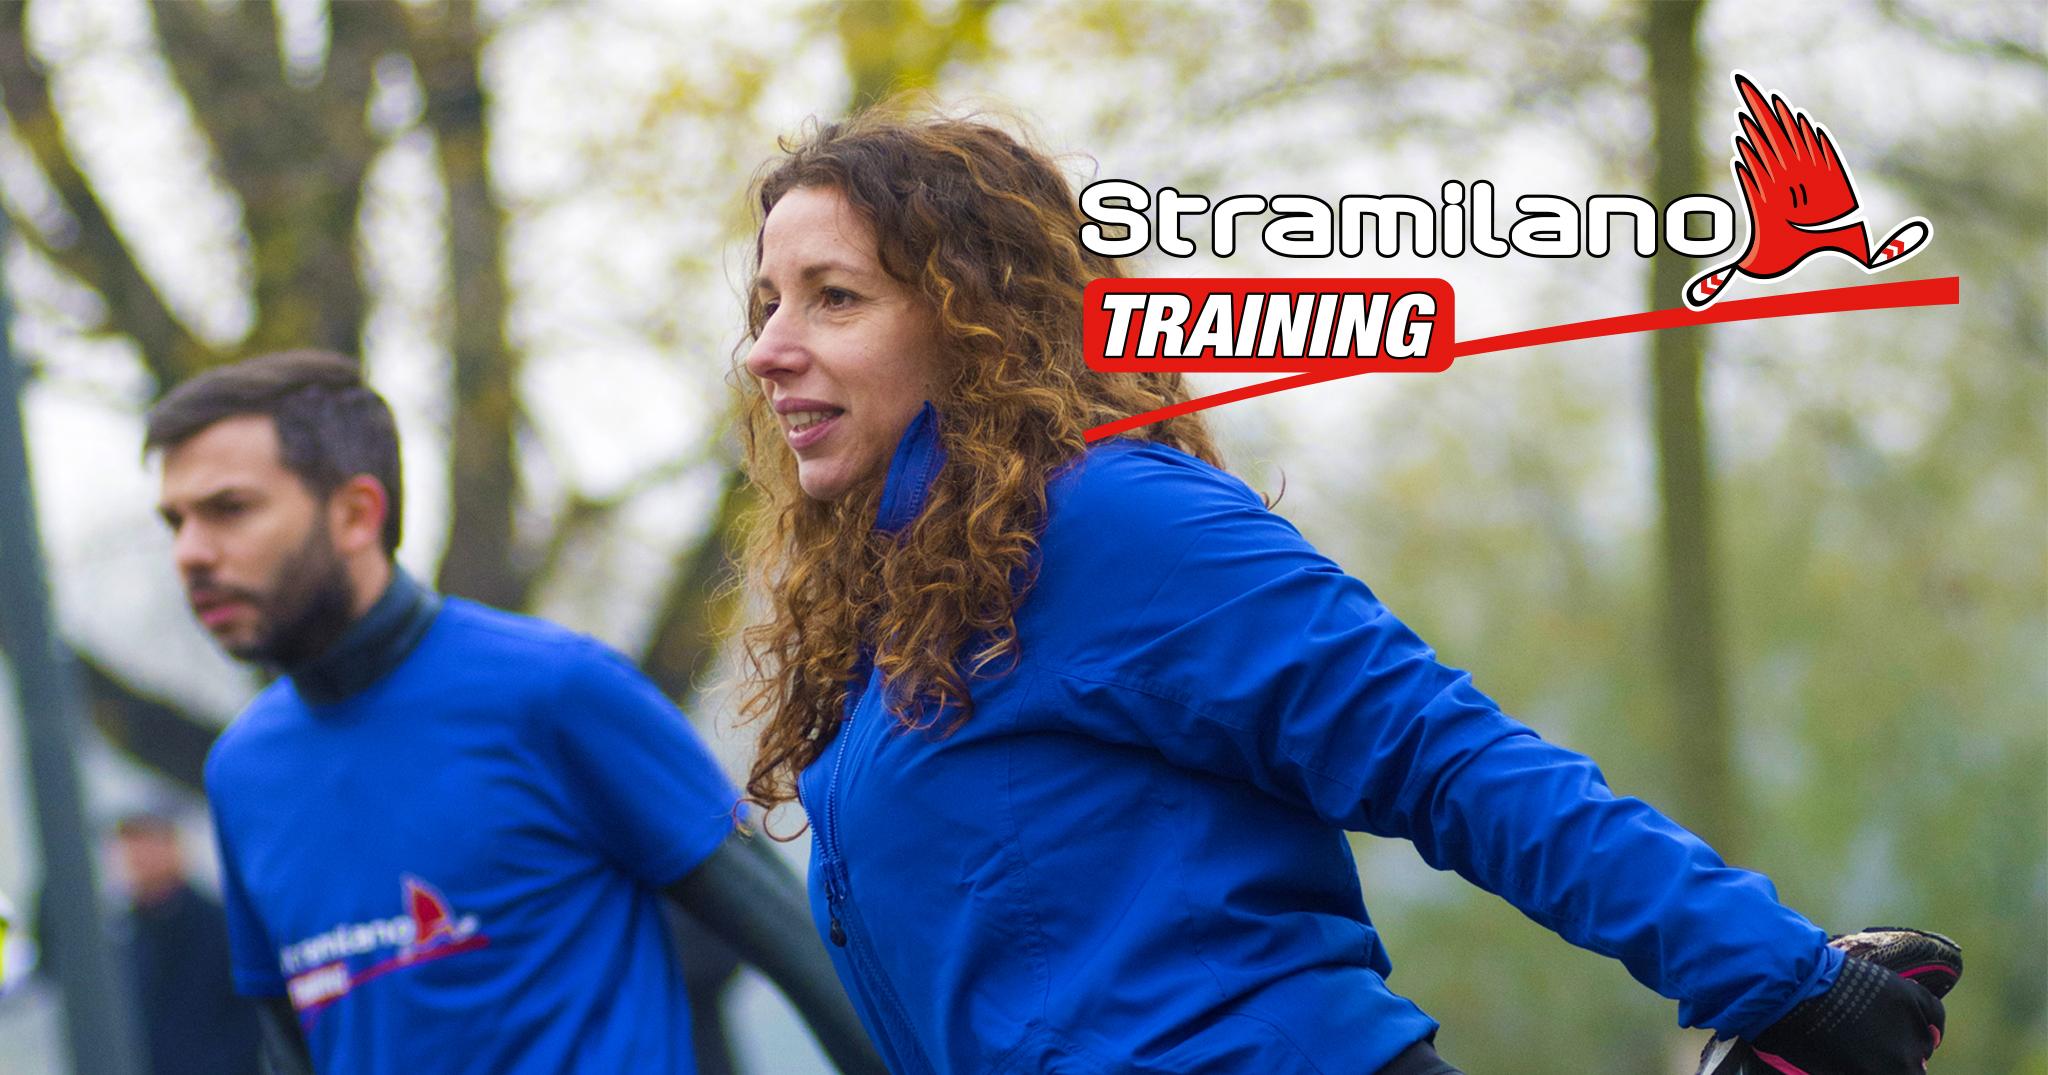 Stramilano Training